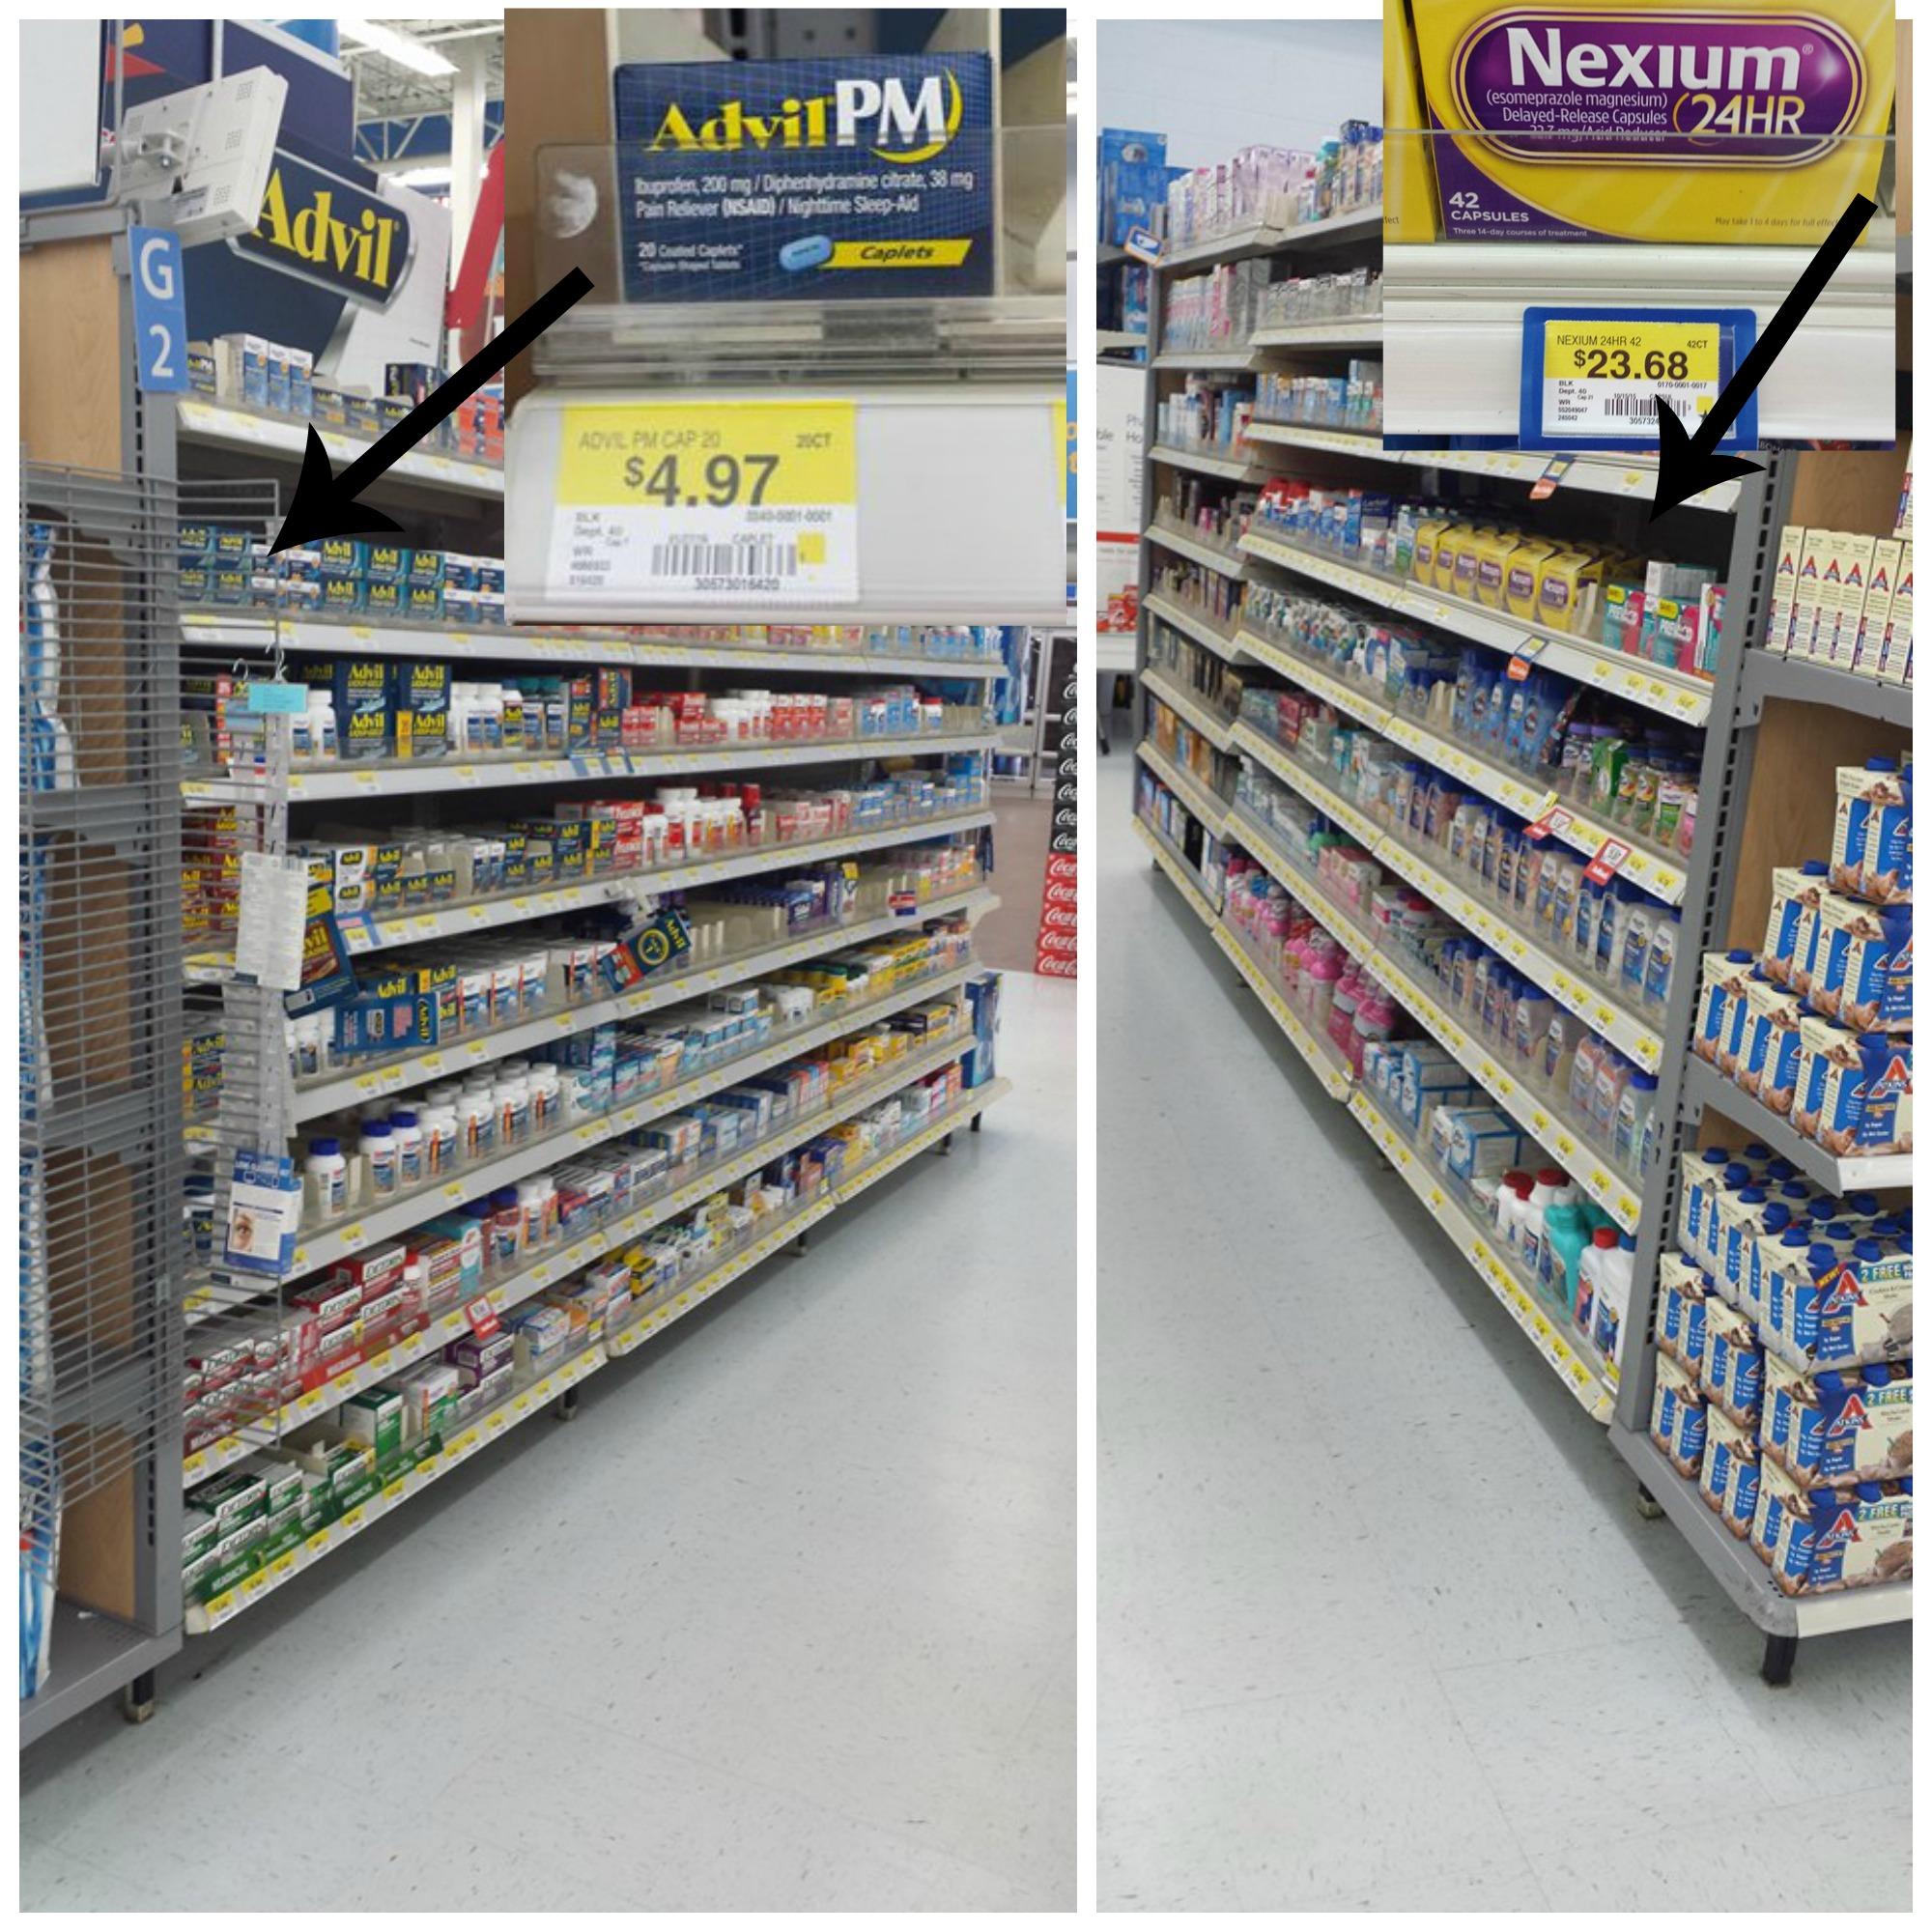 Nexium and Advil PM at Walmart